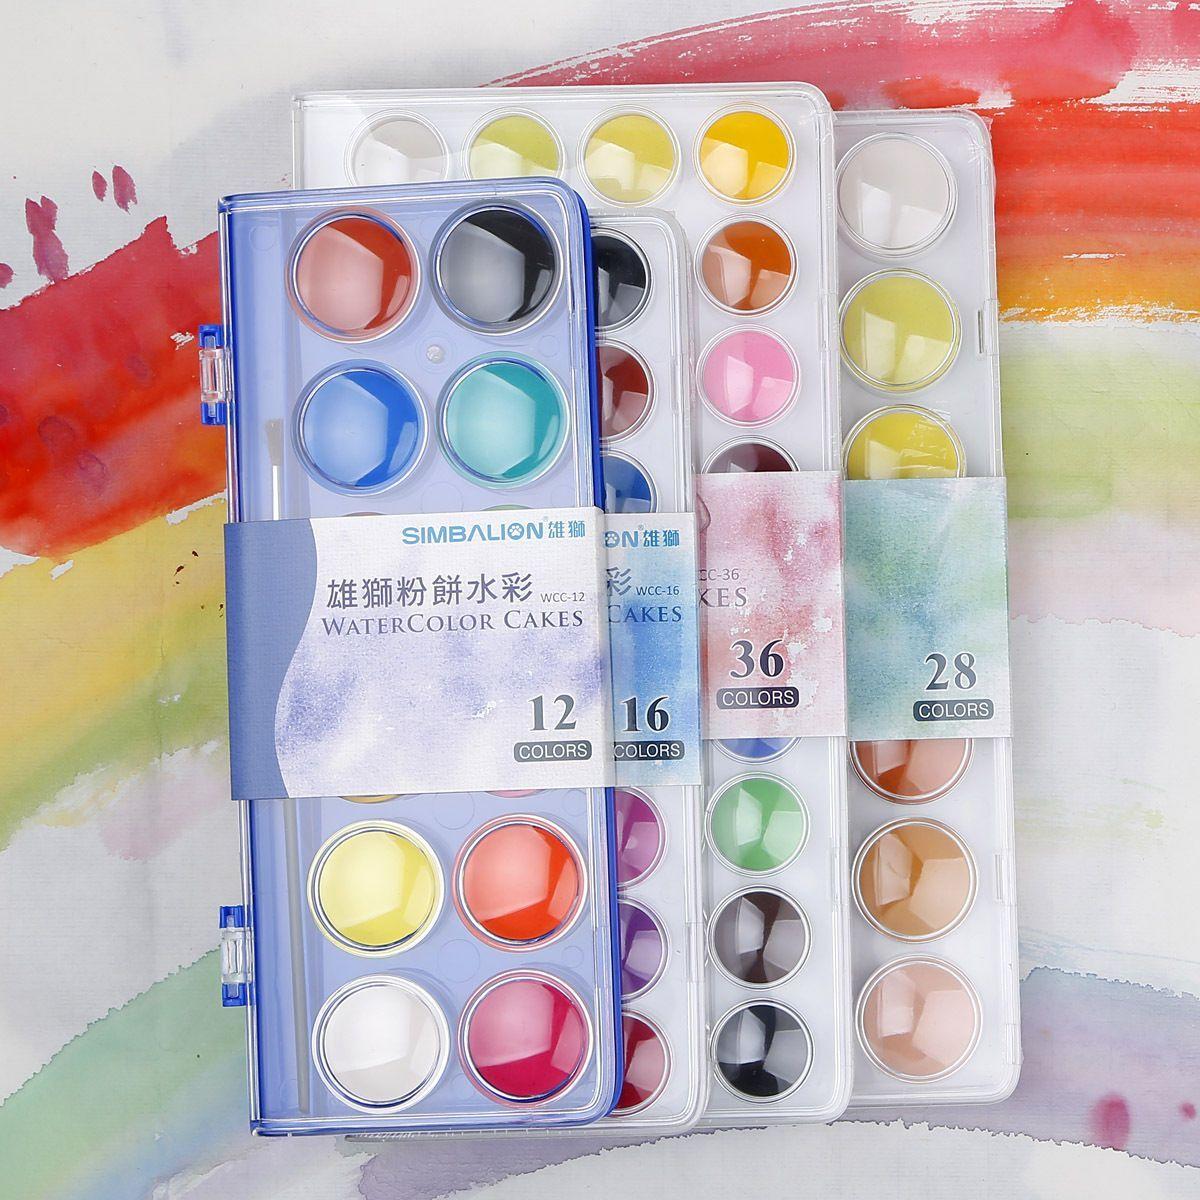 Taiwan Simbalion 12 16 36 Solid Colors Transparent Watercolor